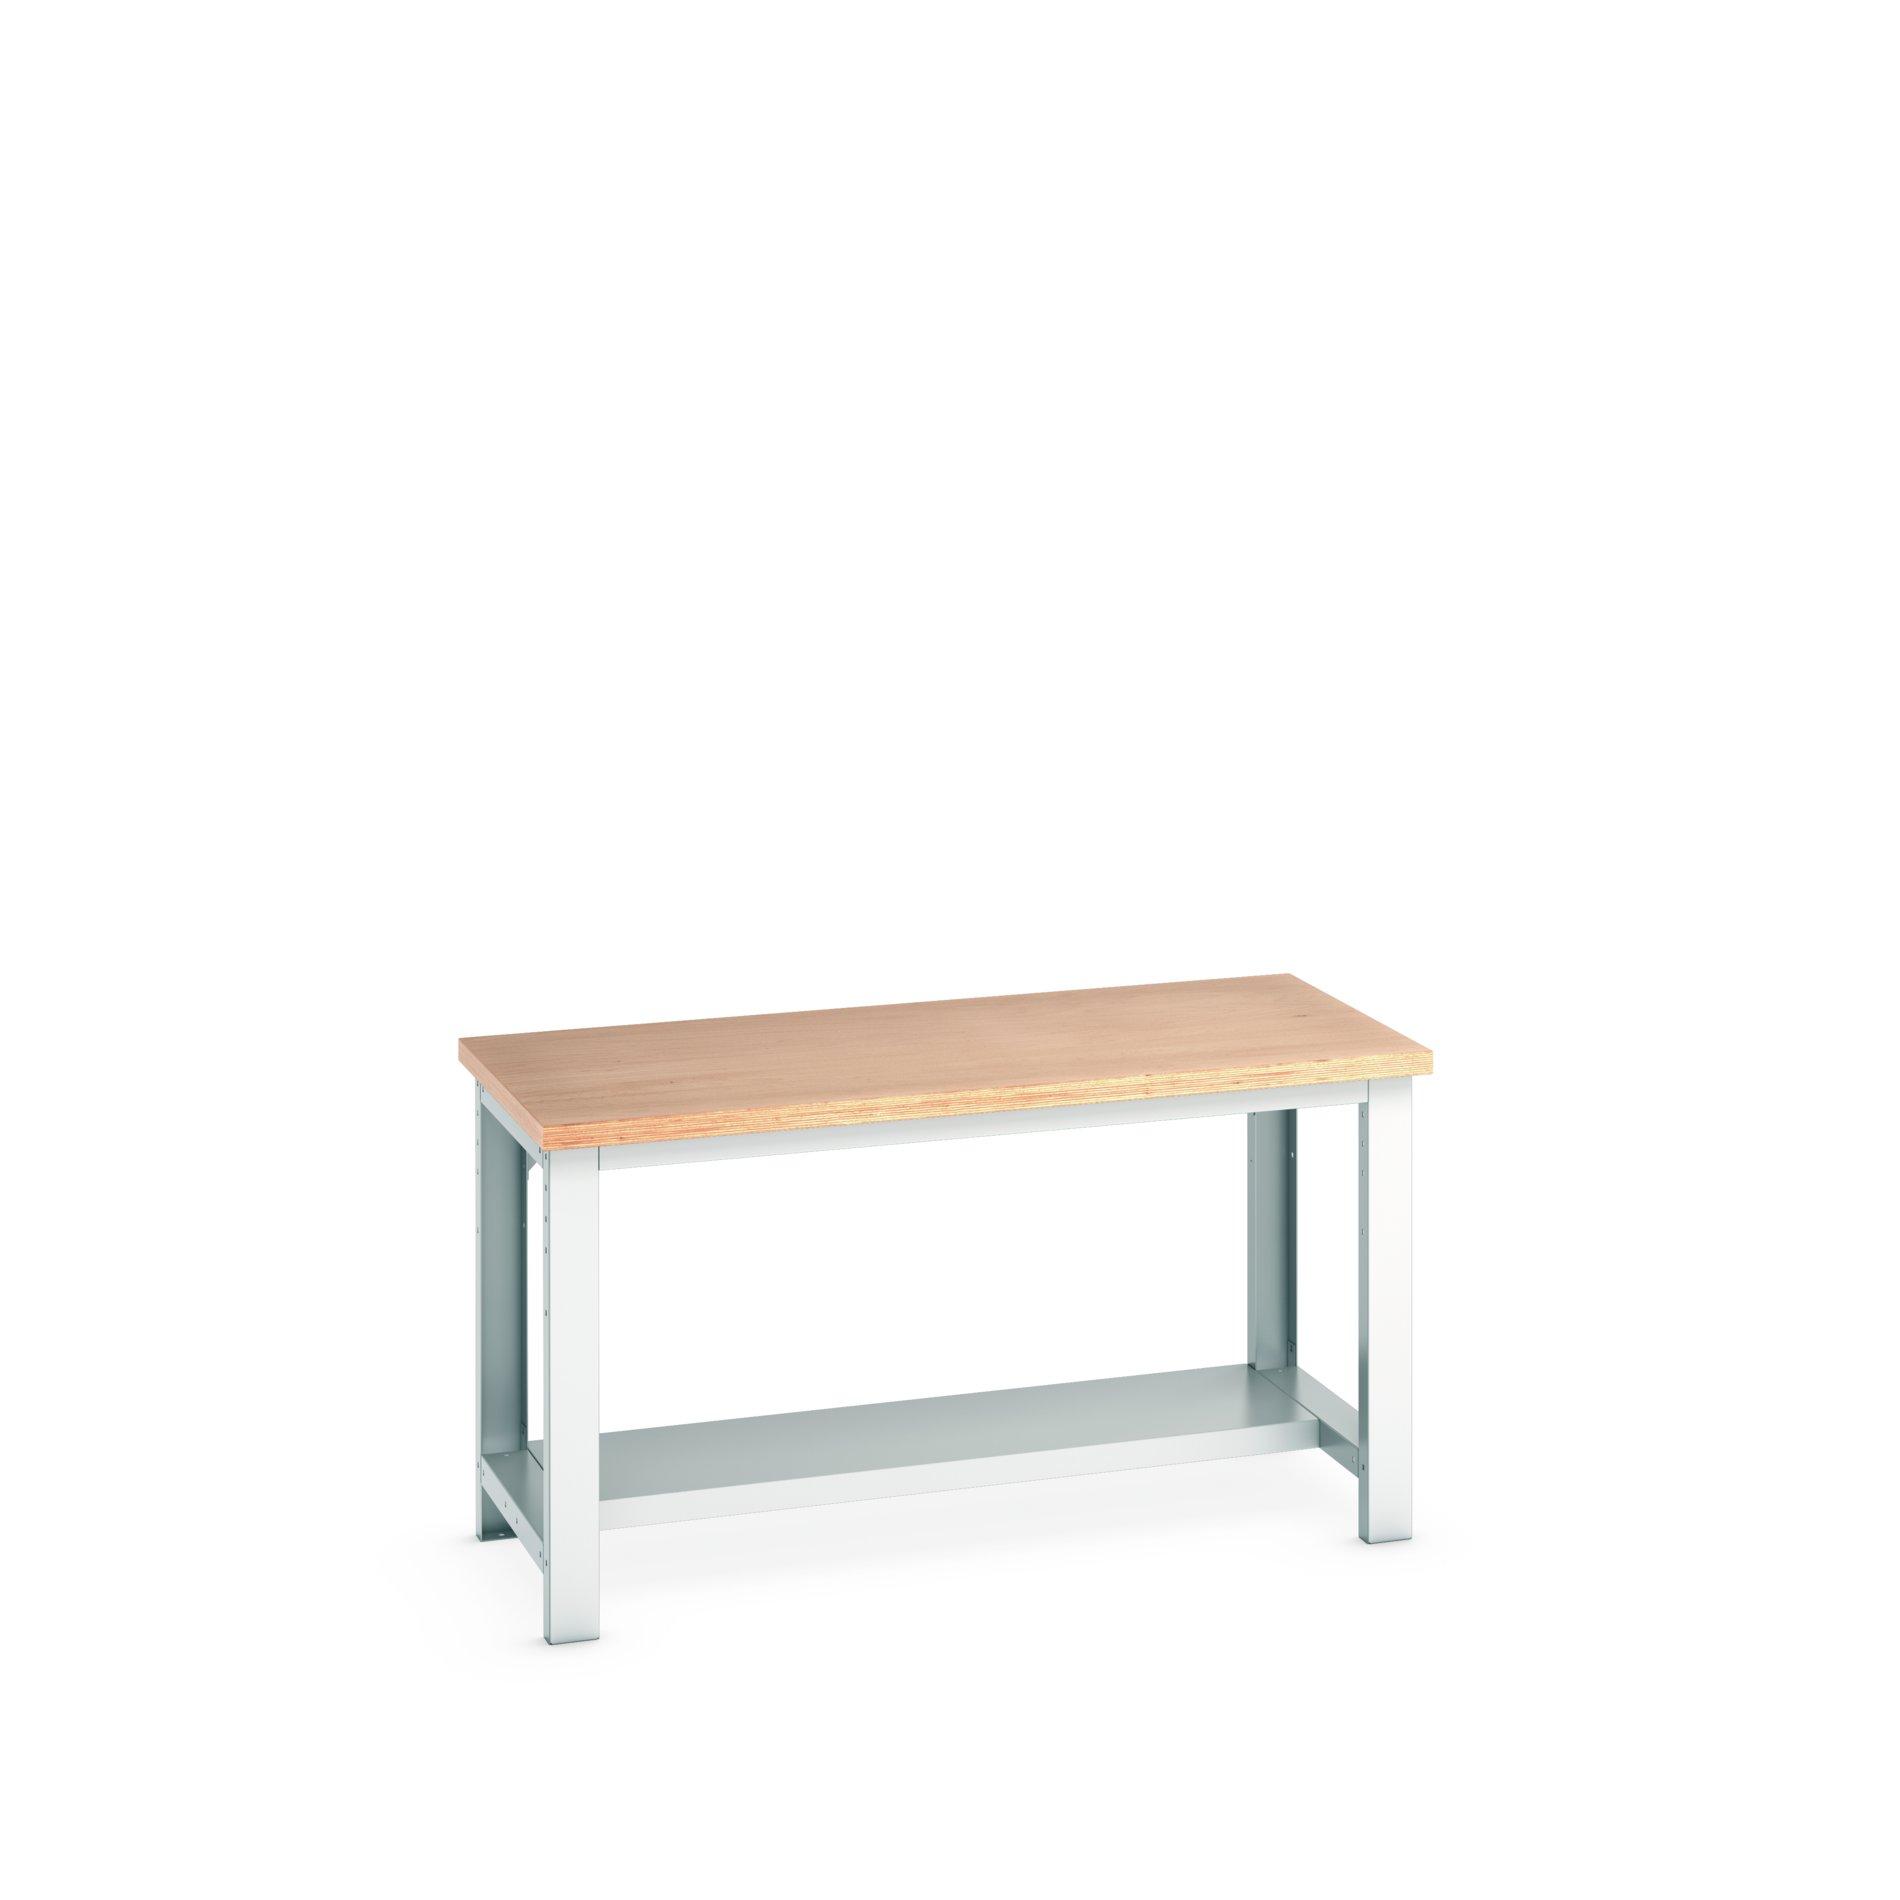 Bott Cubio Framework Bench With Half Depth Base Shelf